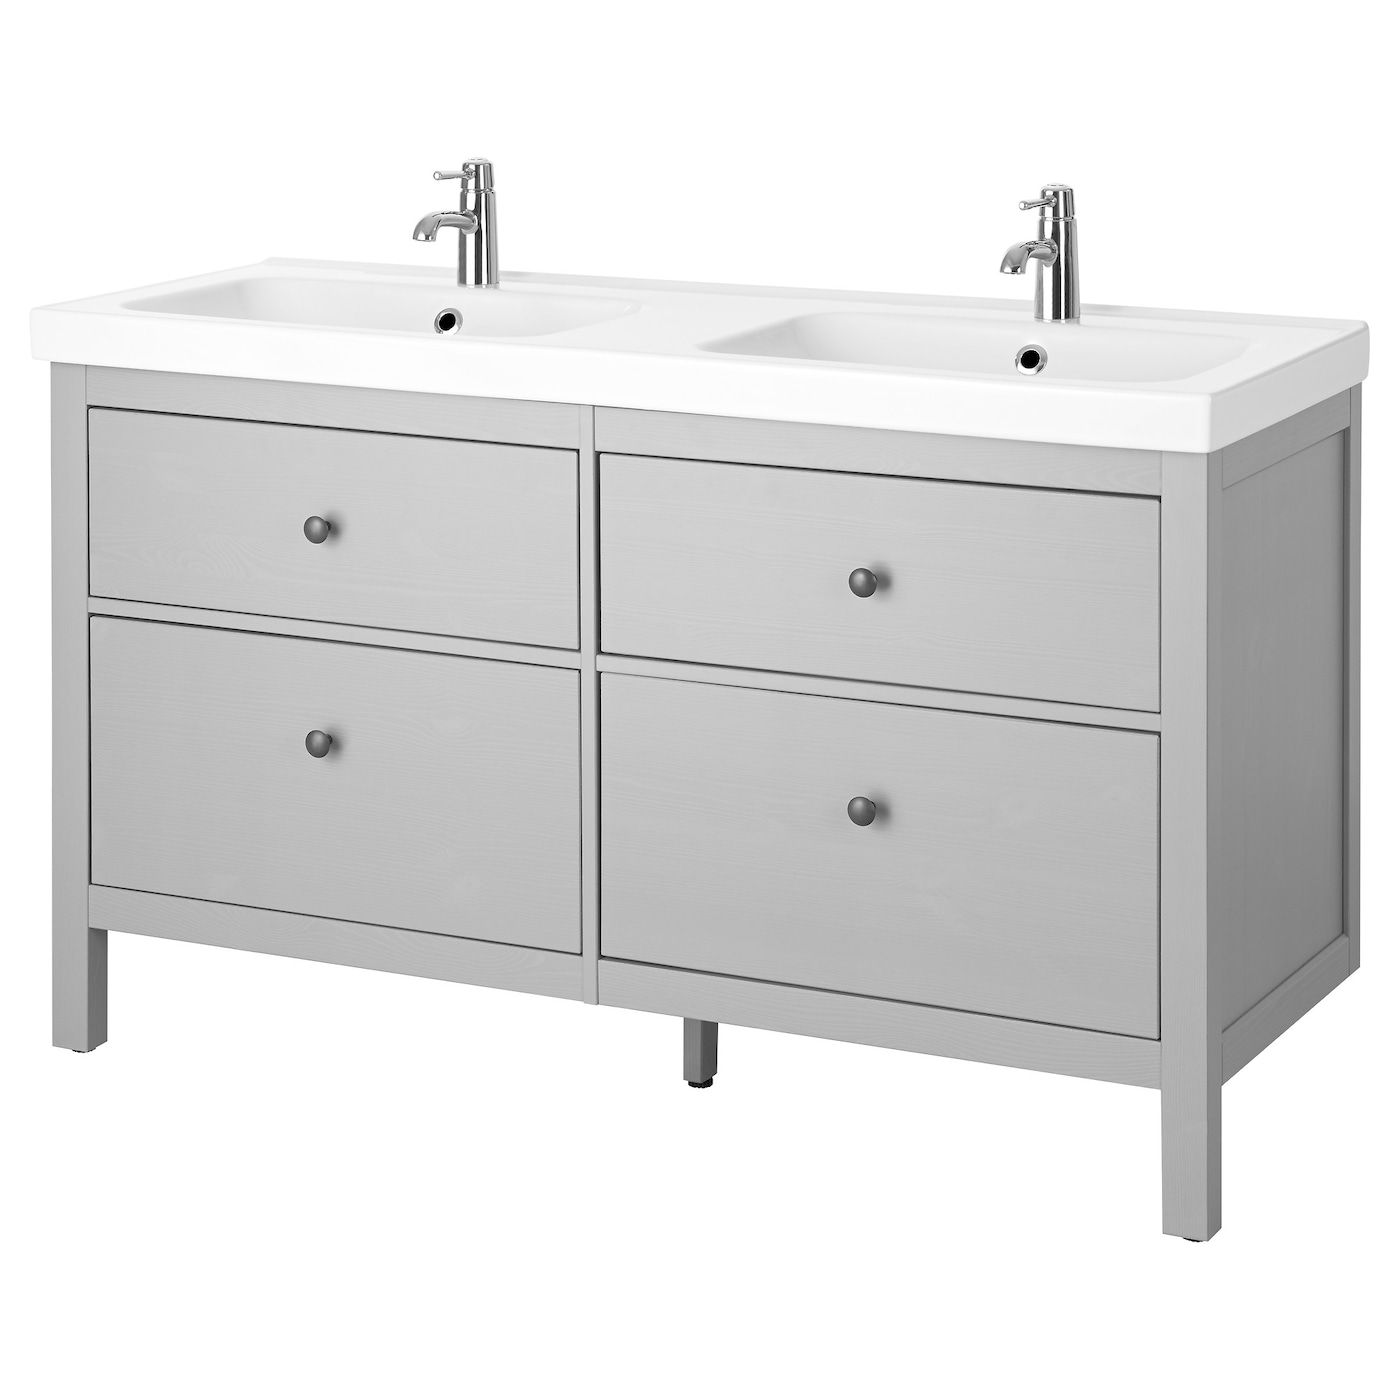 Hemnes Odensvik Sink Cabinet With 4